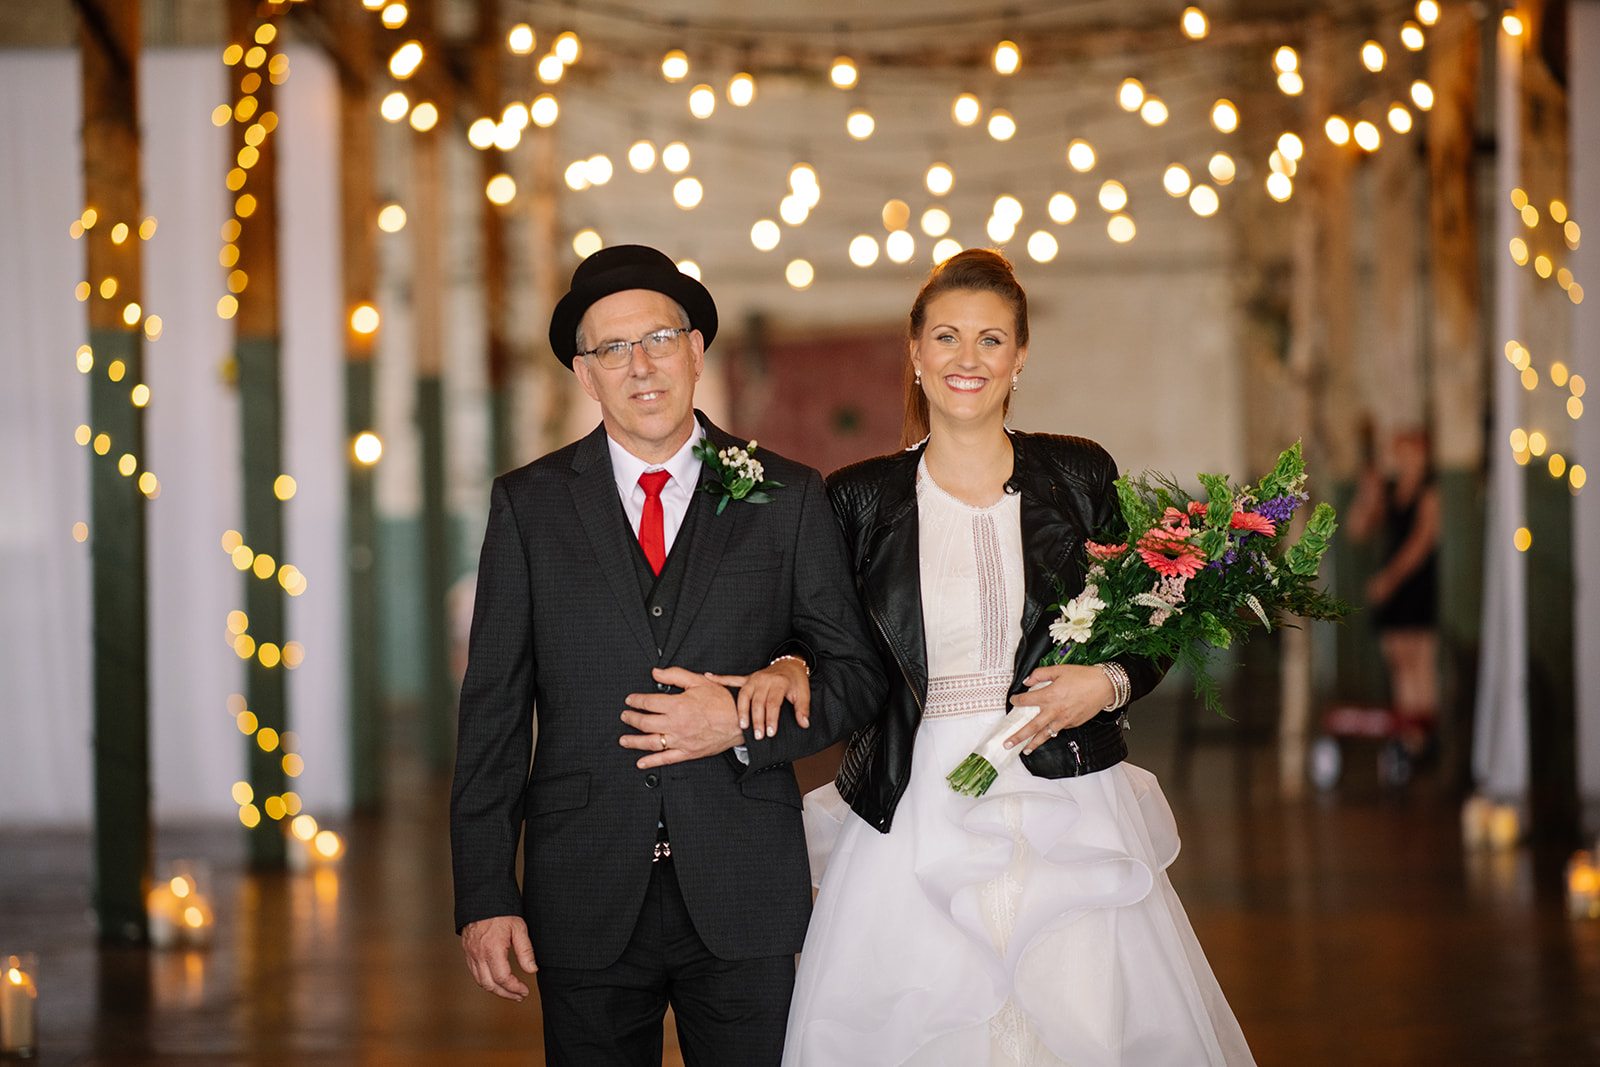 Art Factory Wedding- Audrey+Ryan-Ceremony-Paterson New York- Olivia Christina Photo (53)_websize.jpg